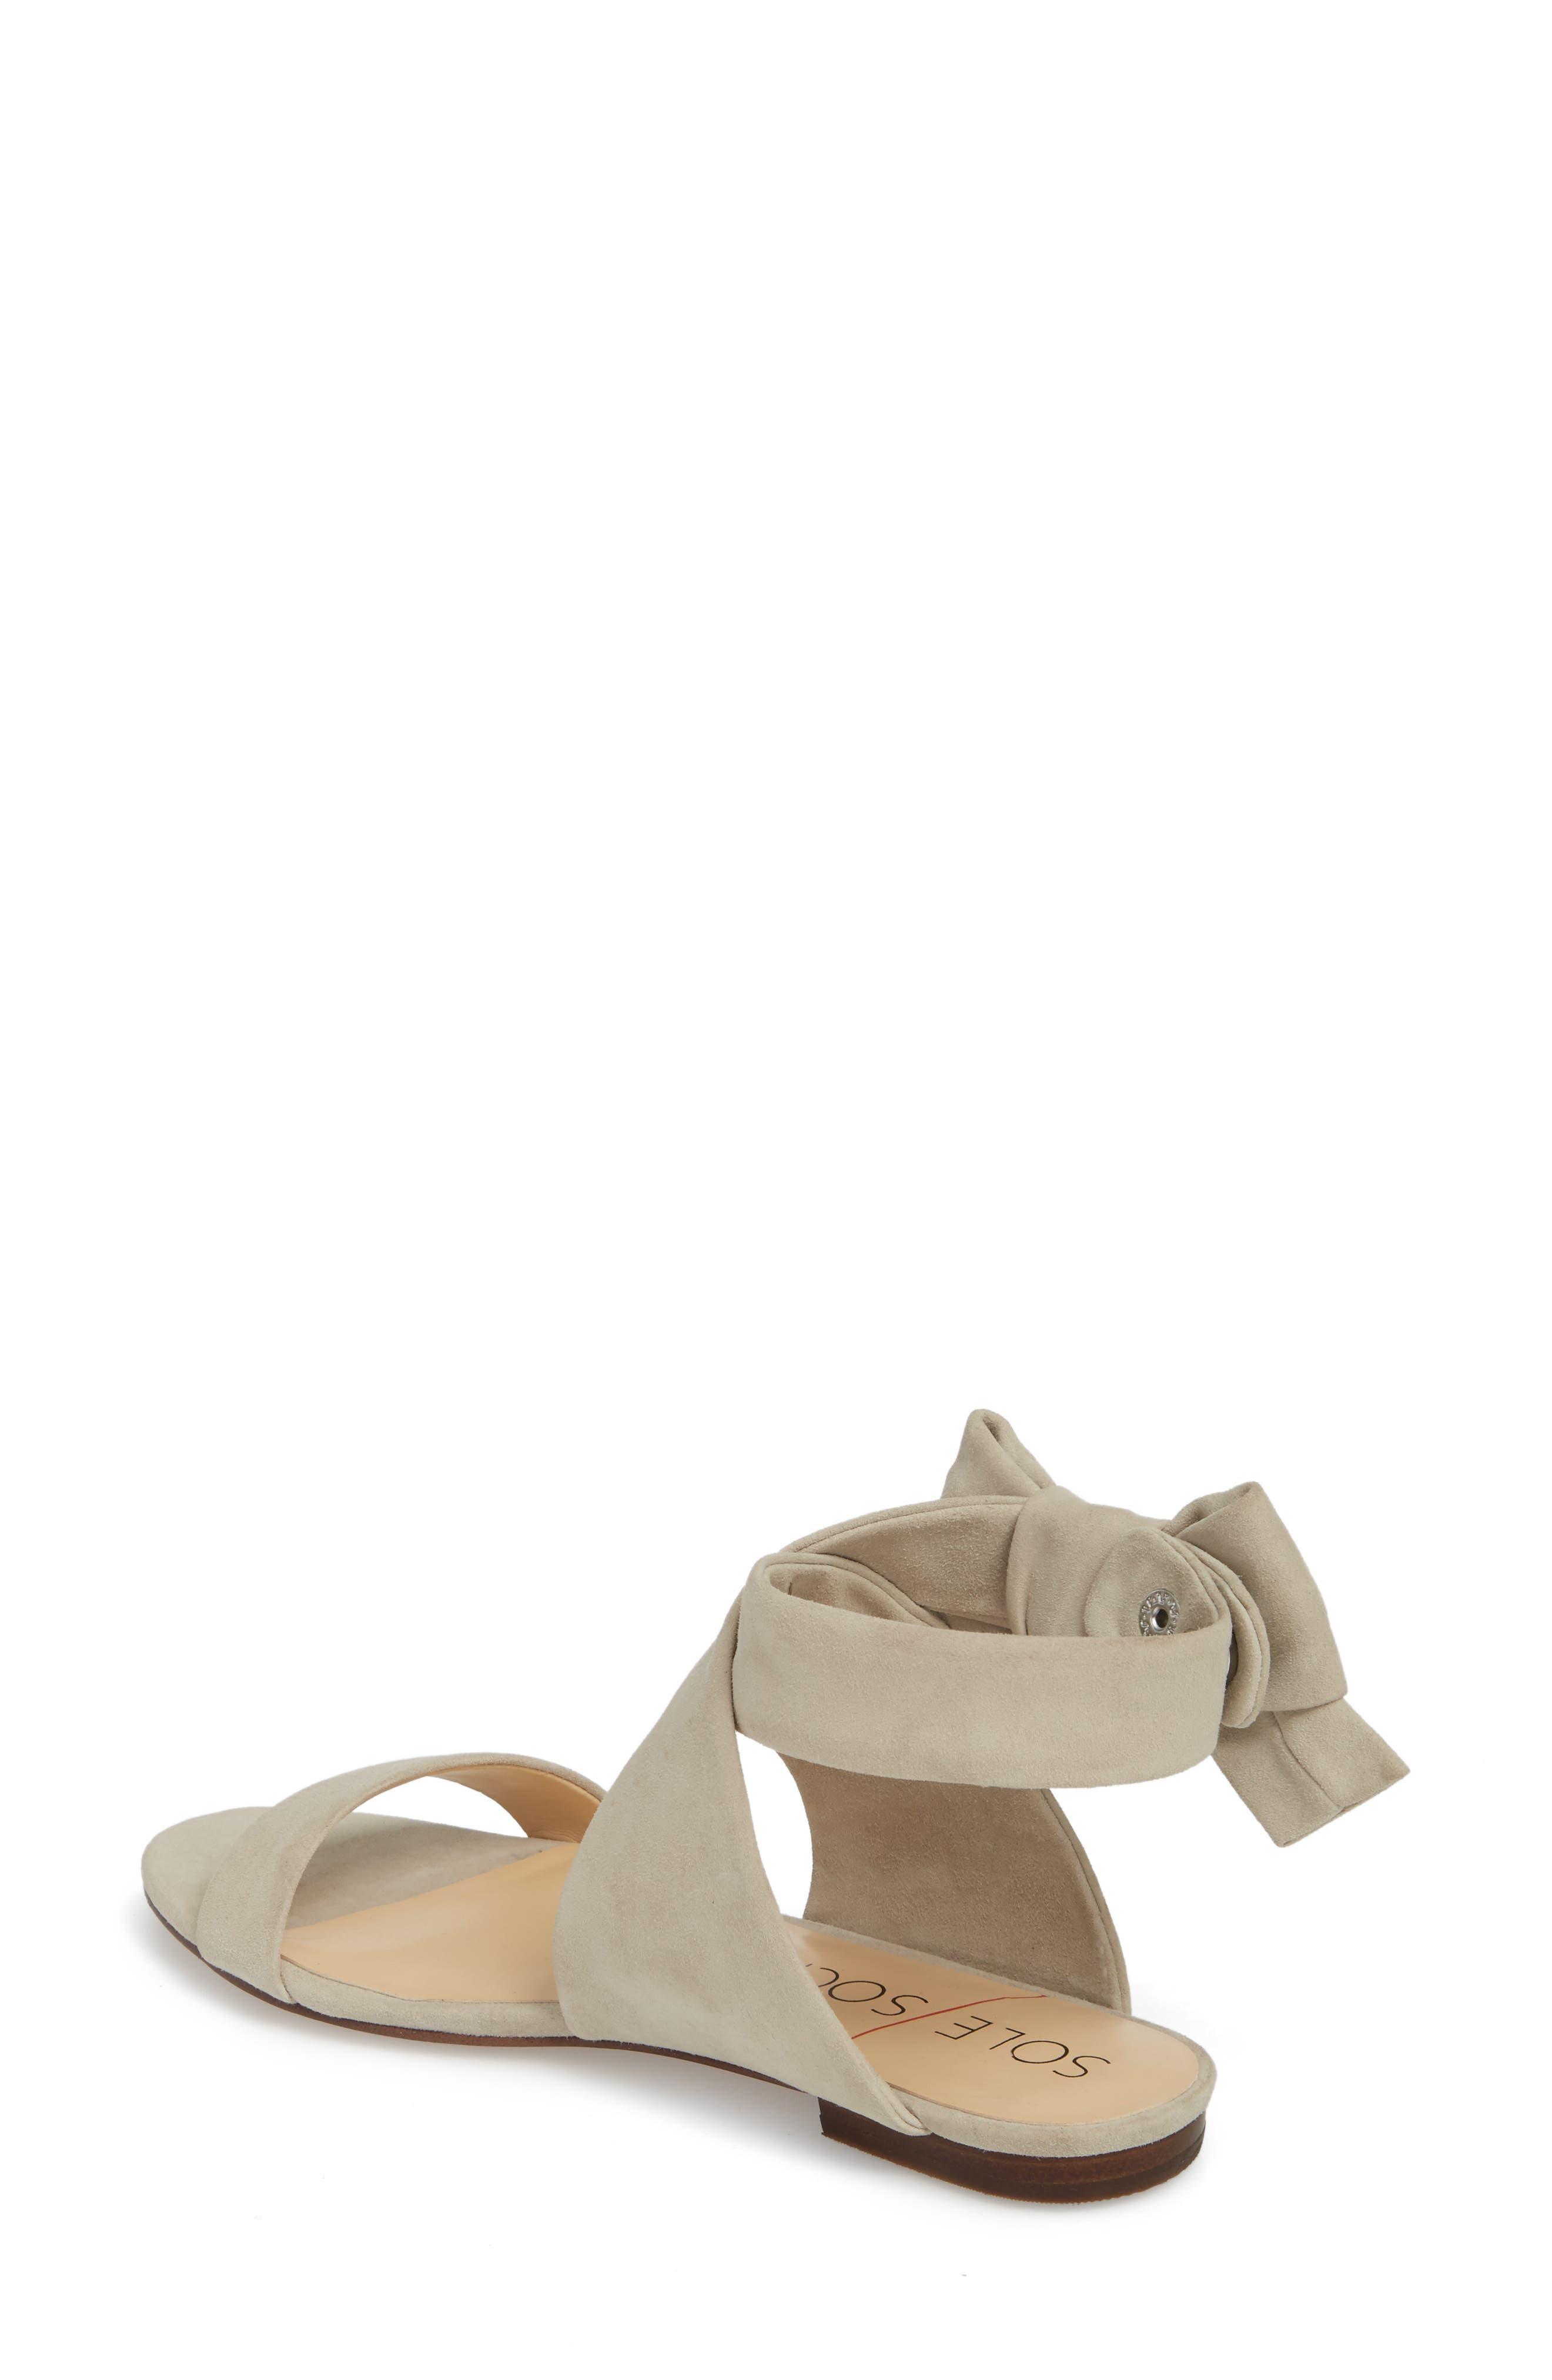 Calynda Bow Ankle Wrap Sandal,                             Alternate thumbnail 2, color,                             020